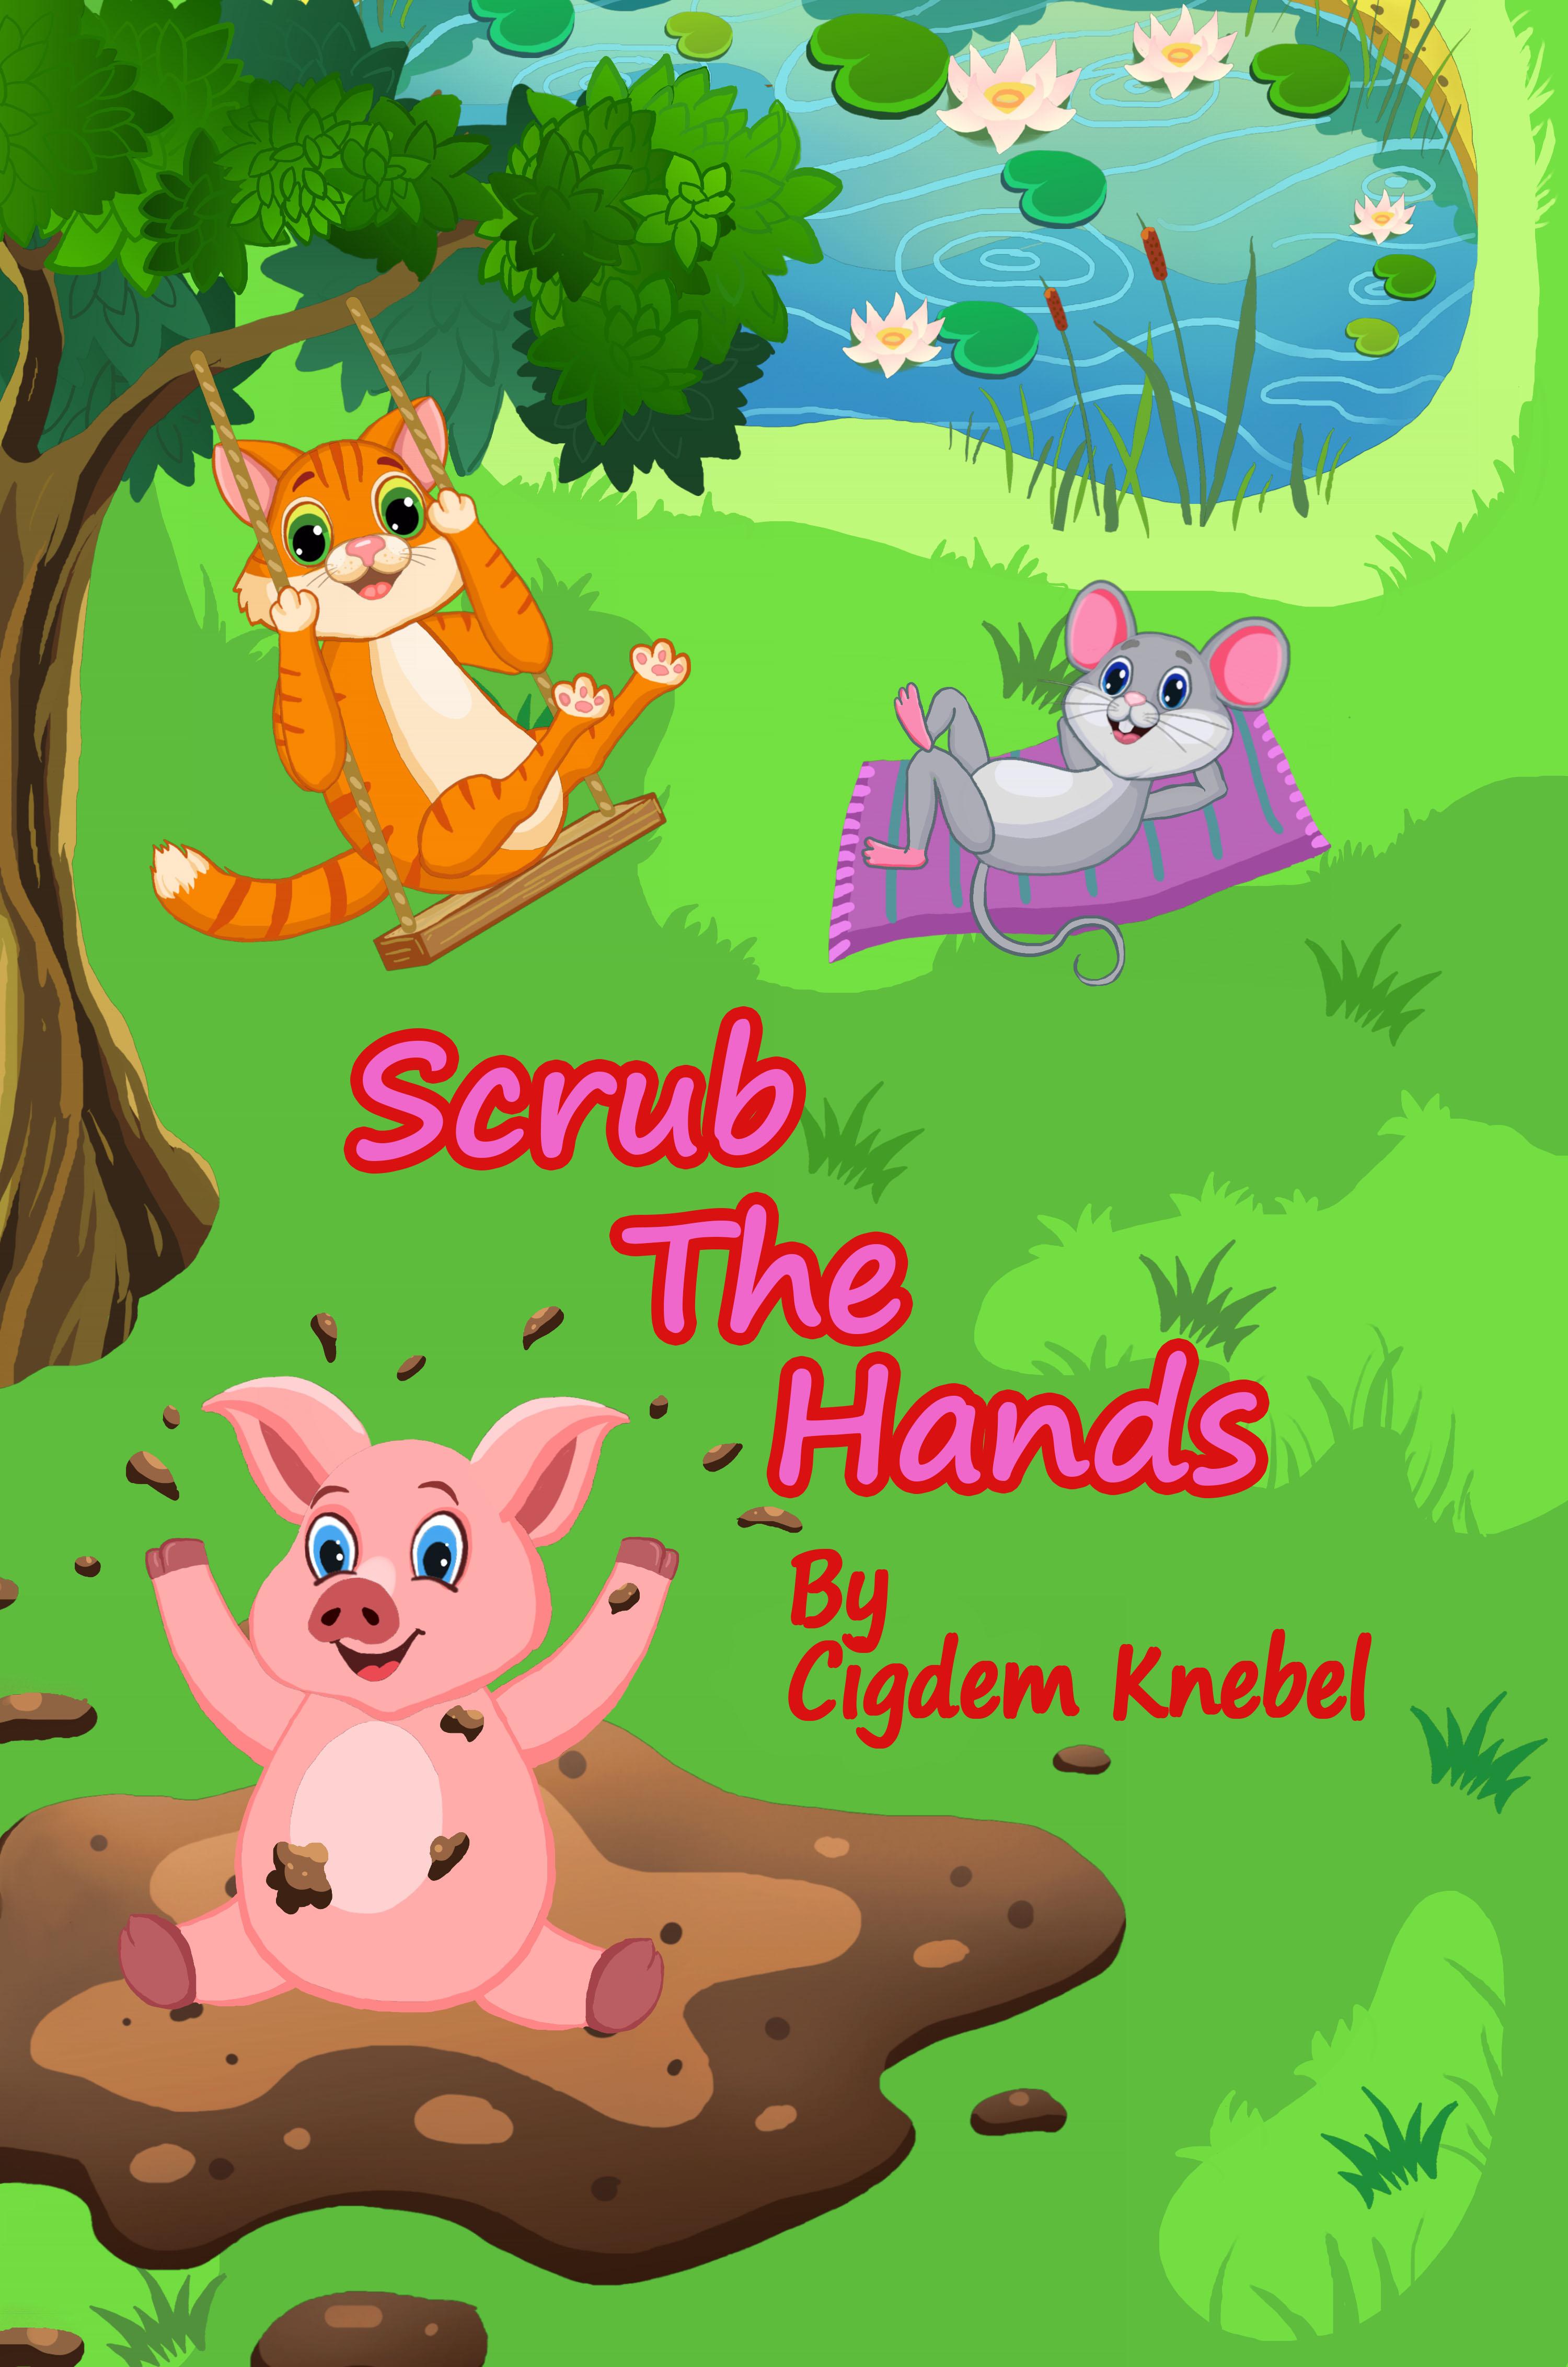 Scrub The Hands